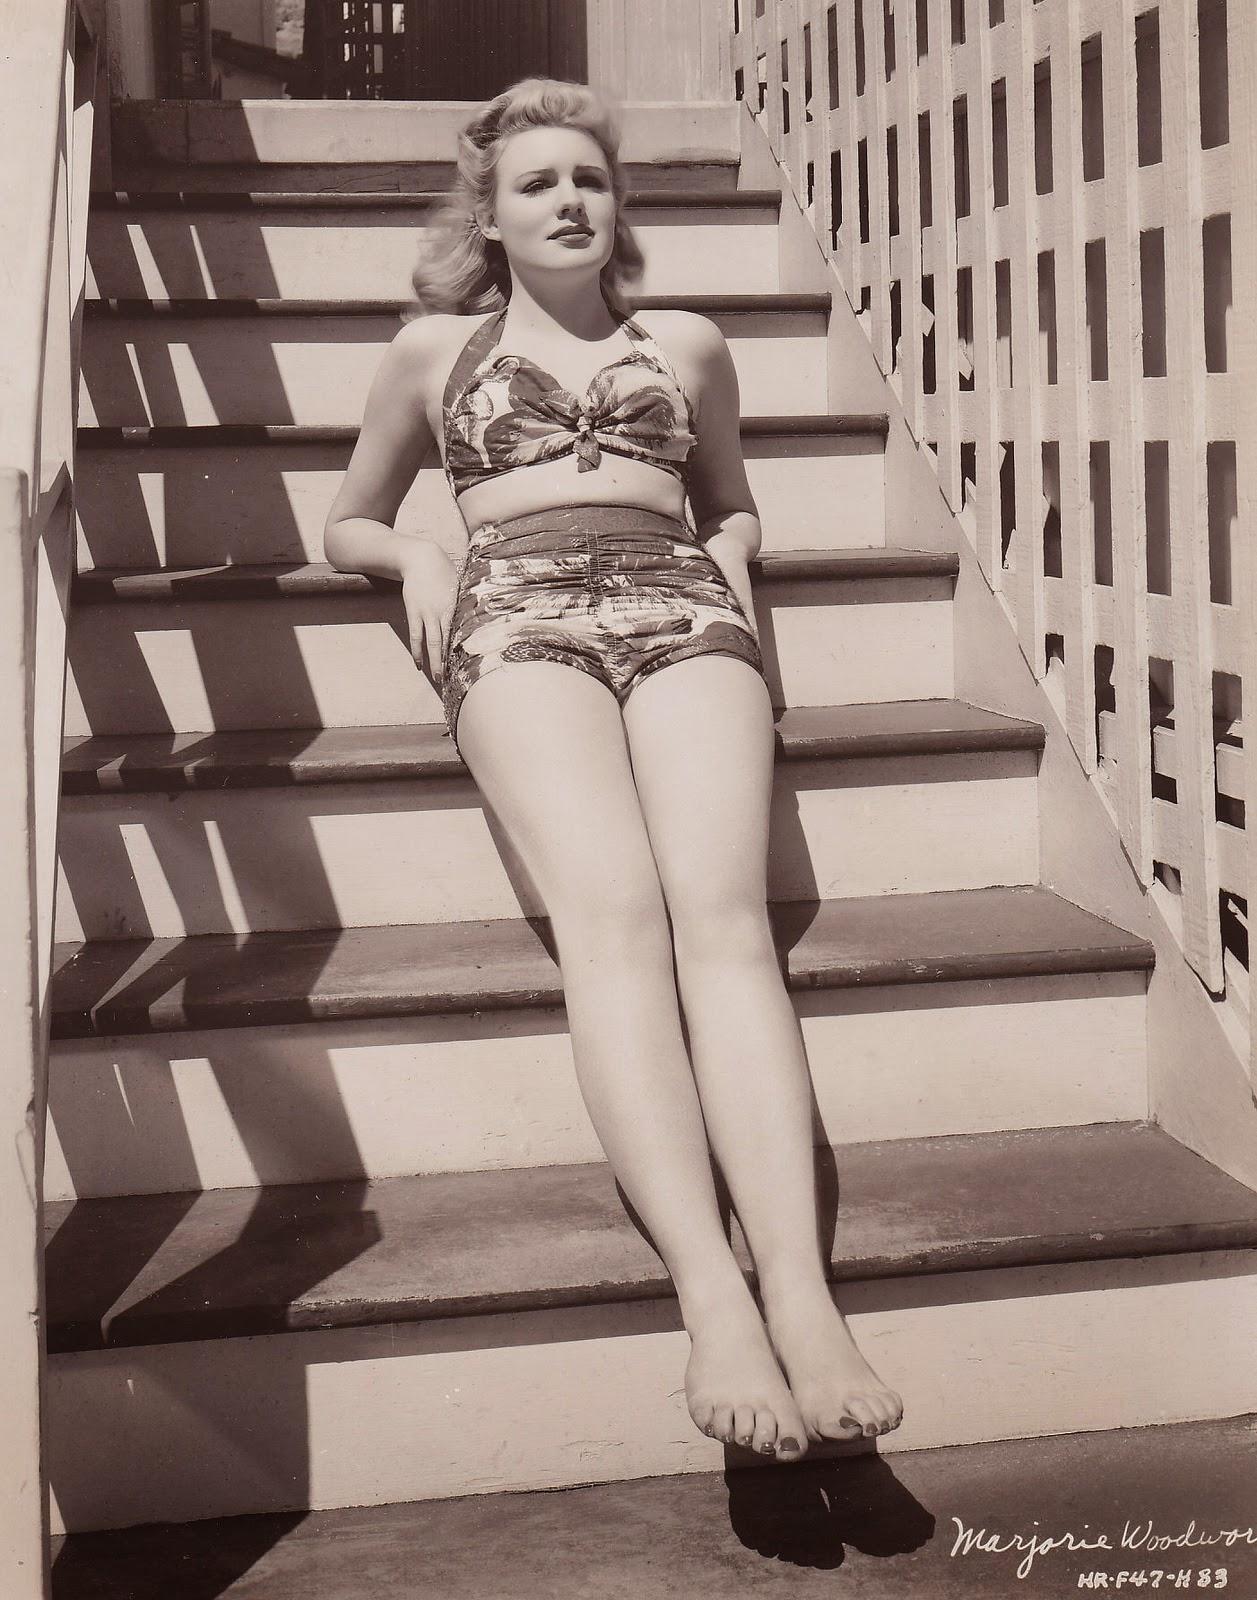 Hot Actress Julie Bishop